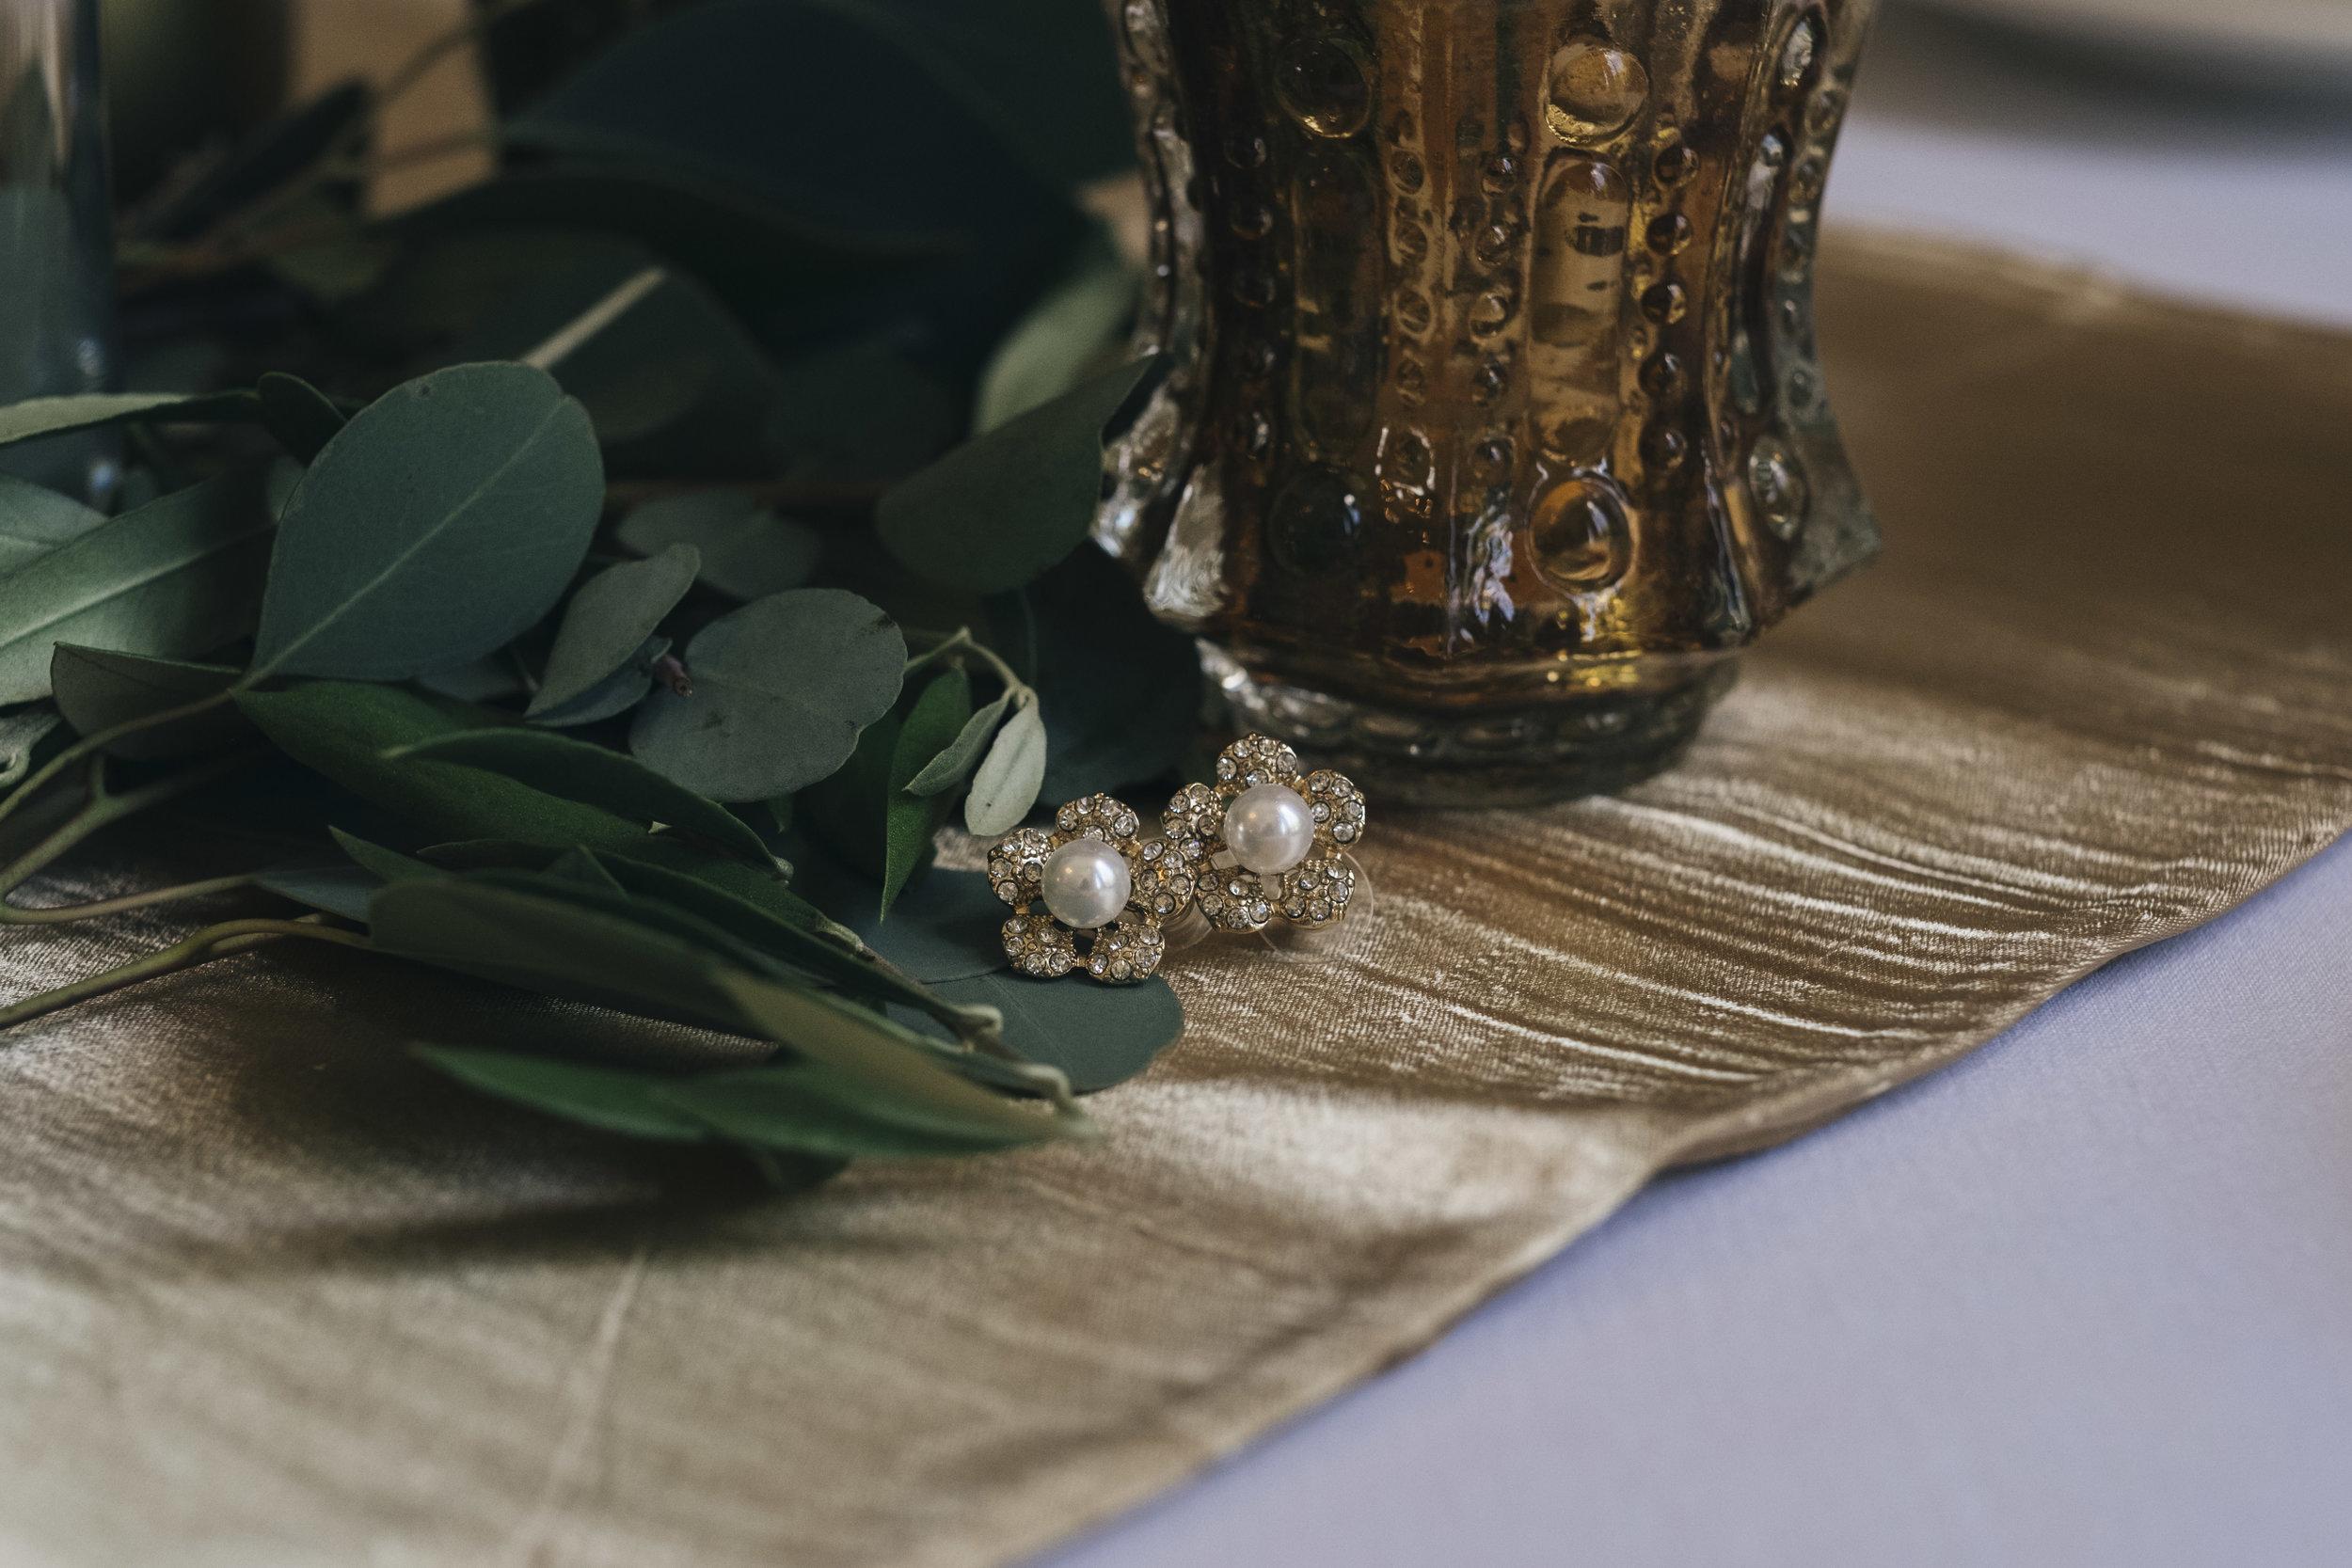 The bride's flower earrings